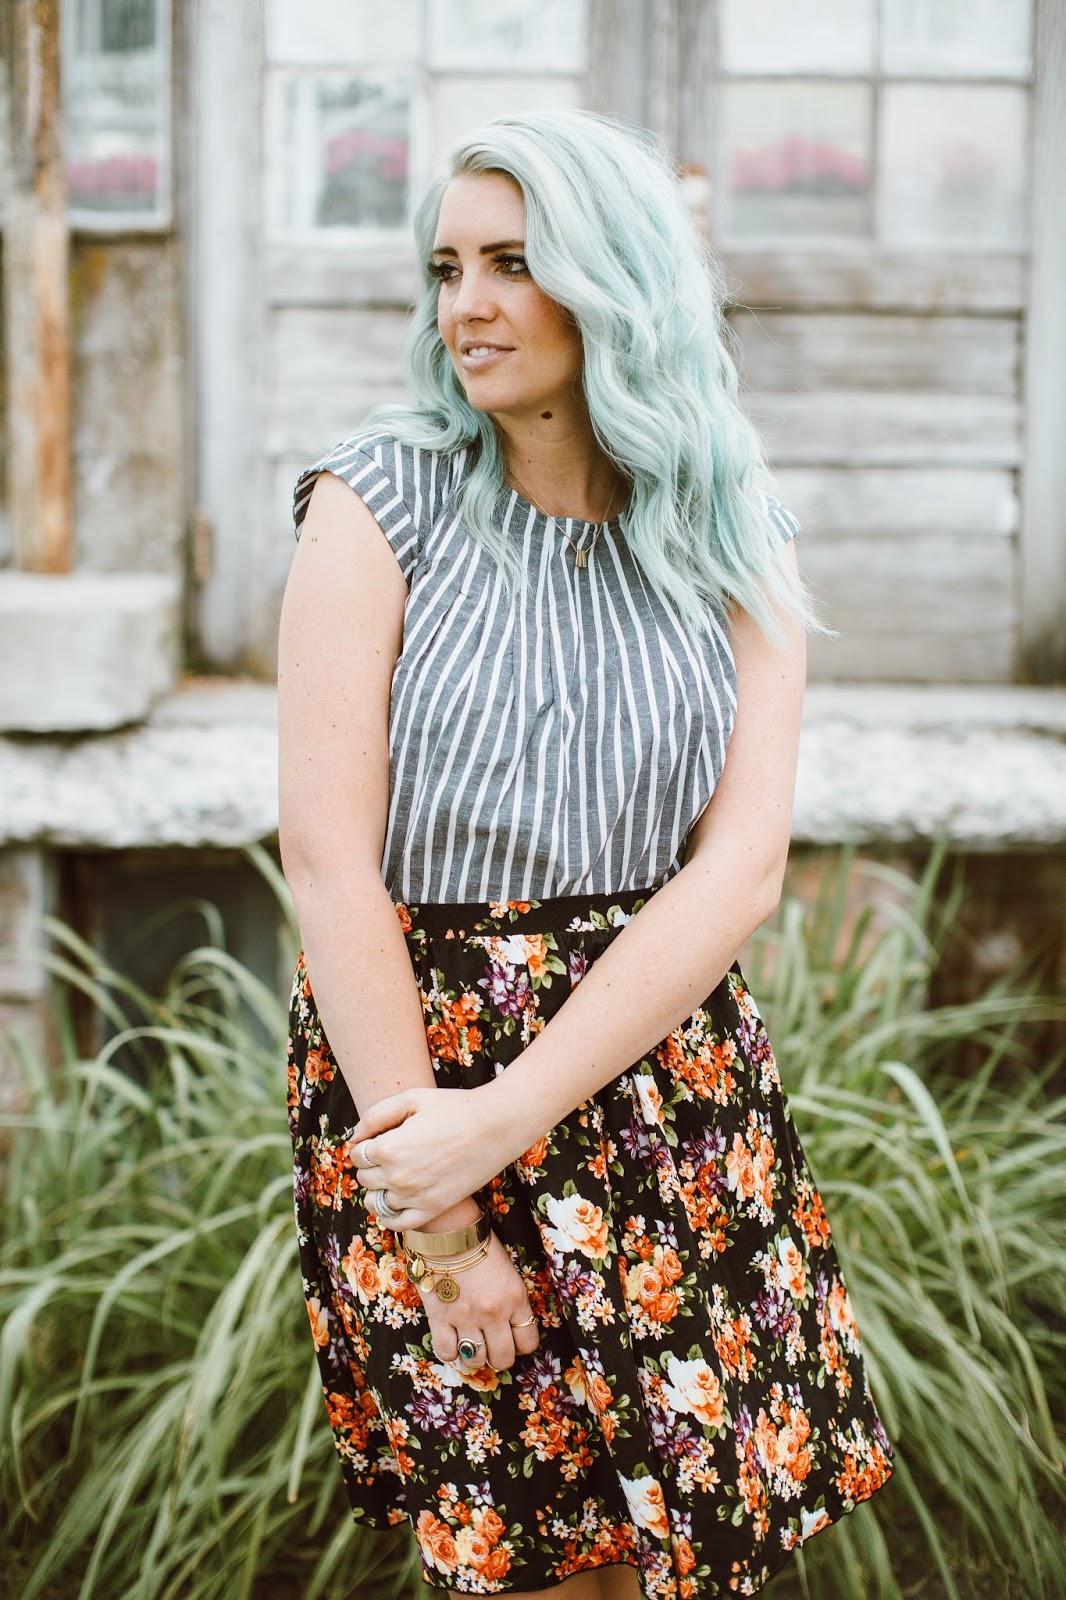 Floral Skirt, Modest Fashion blogger, Stripes